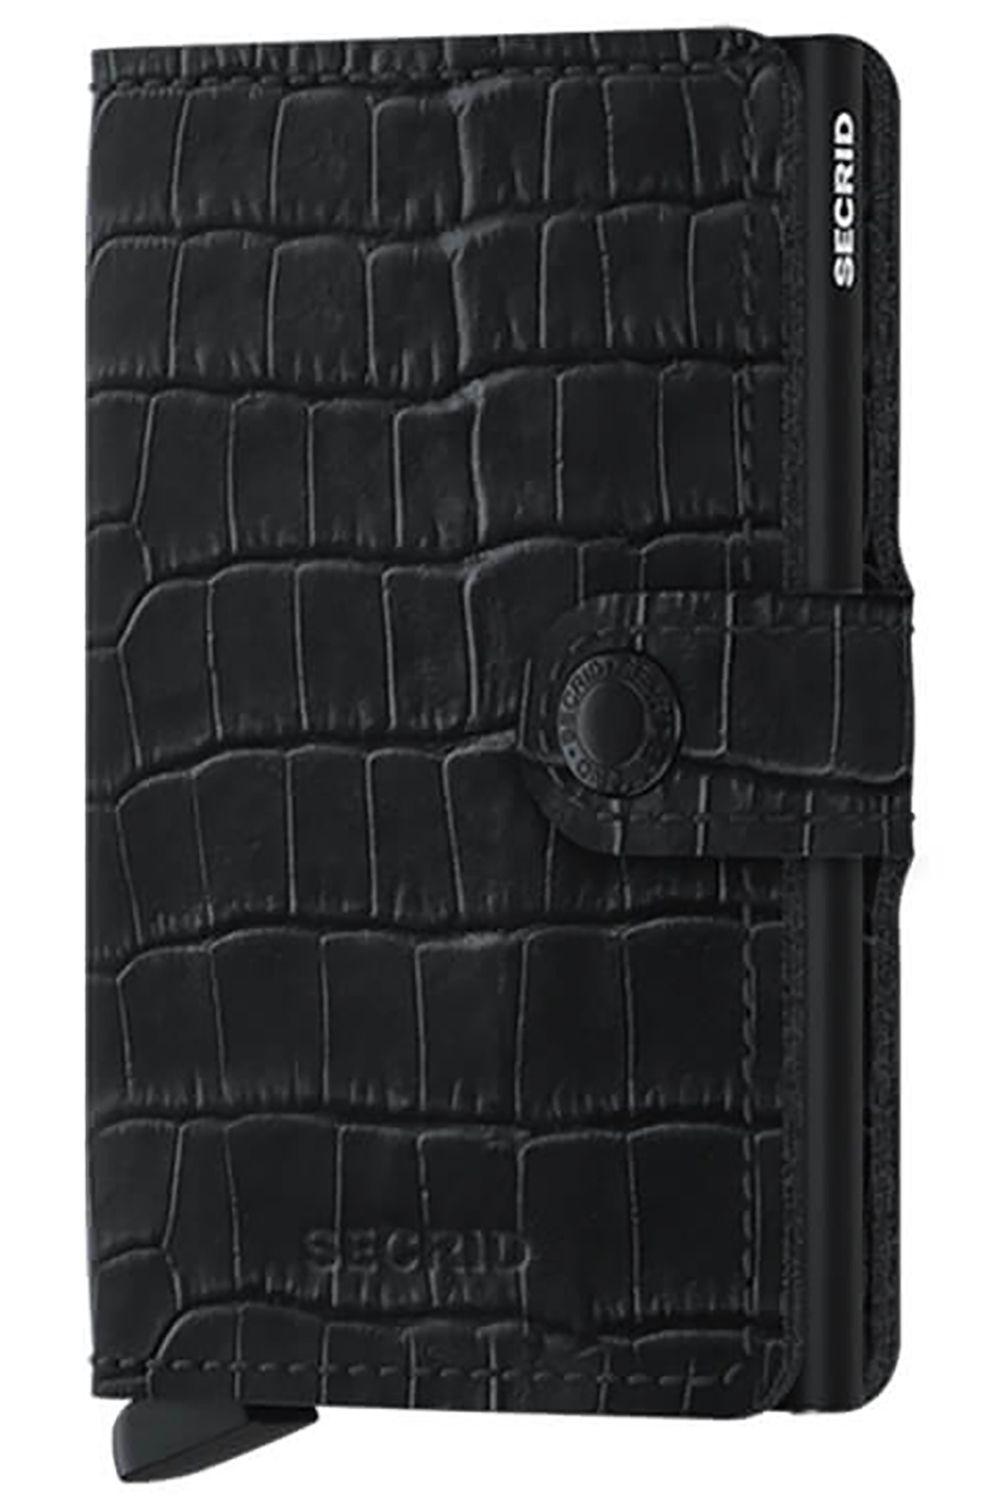 Secrid Leather Wallet MINIWALLET CLEO Black